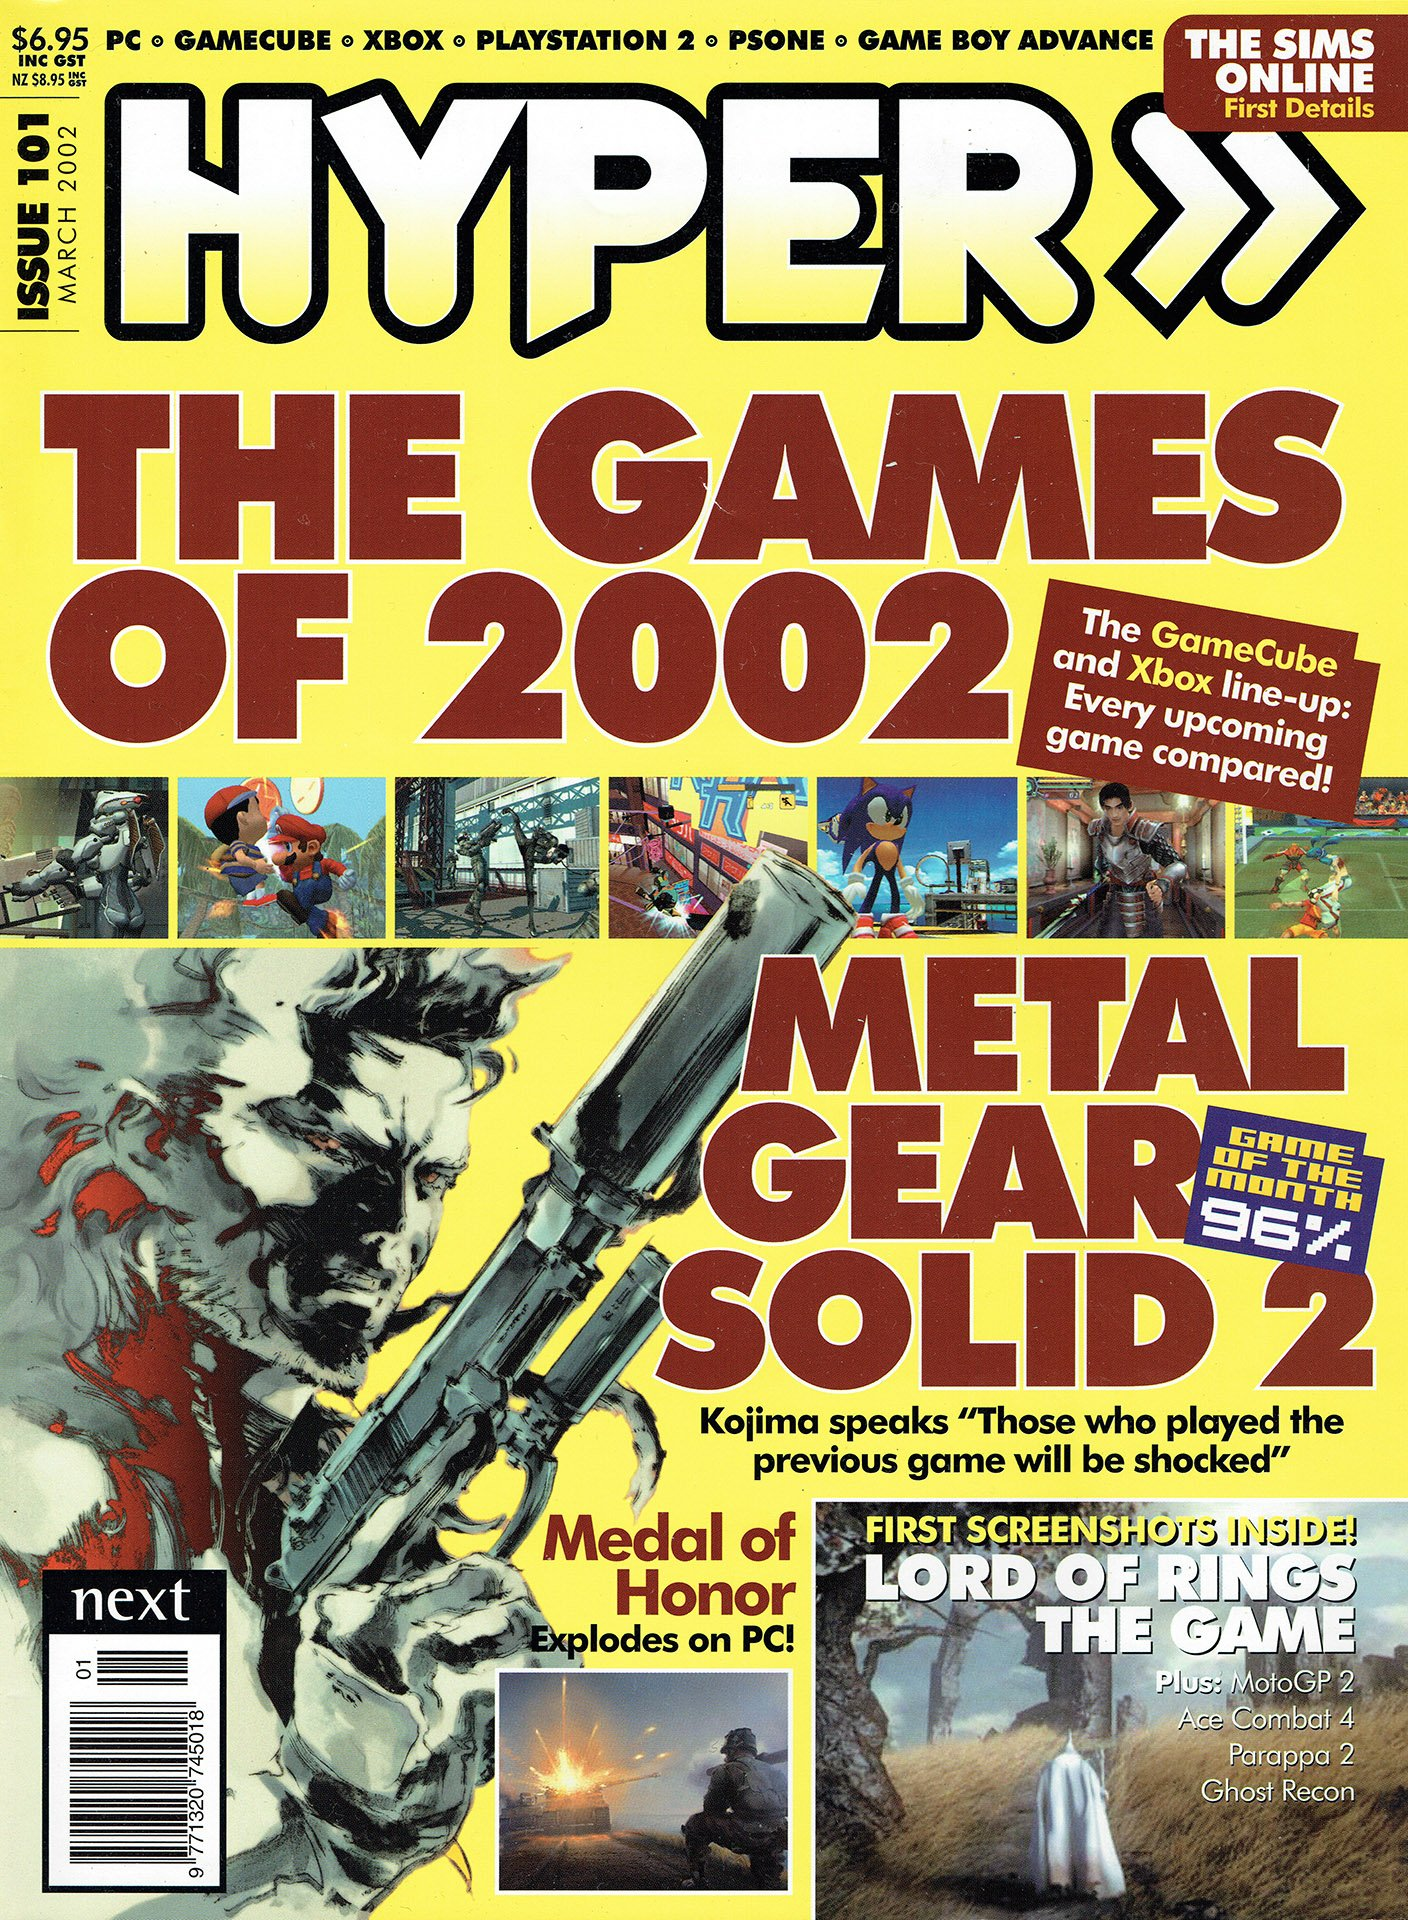 Hyper 101 (March 2002)